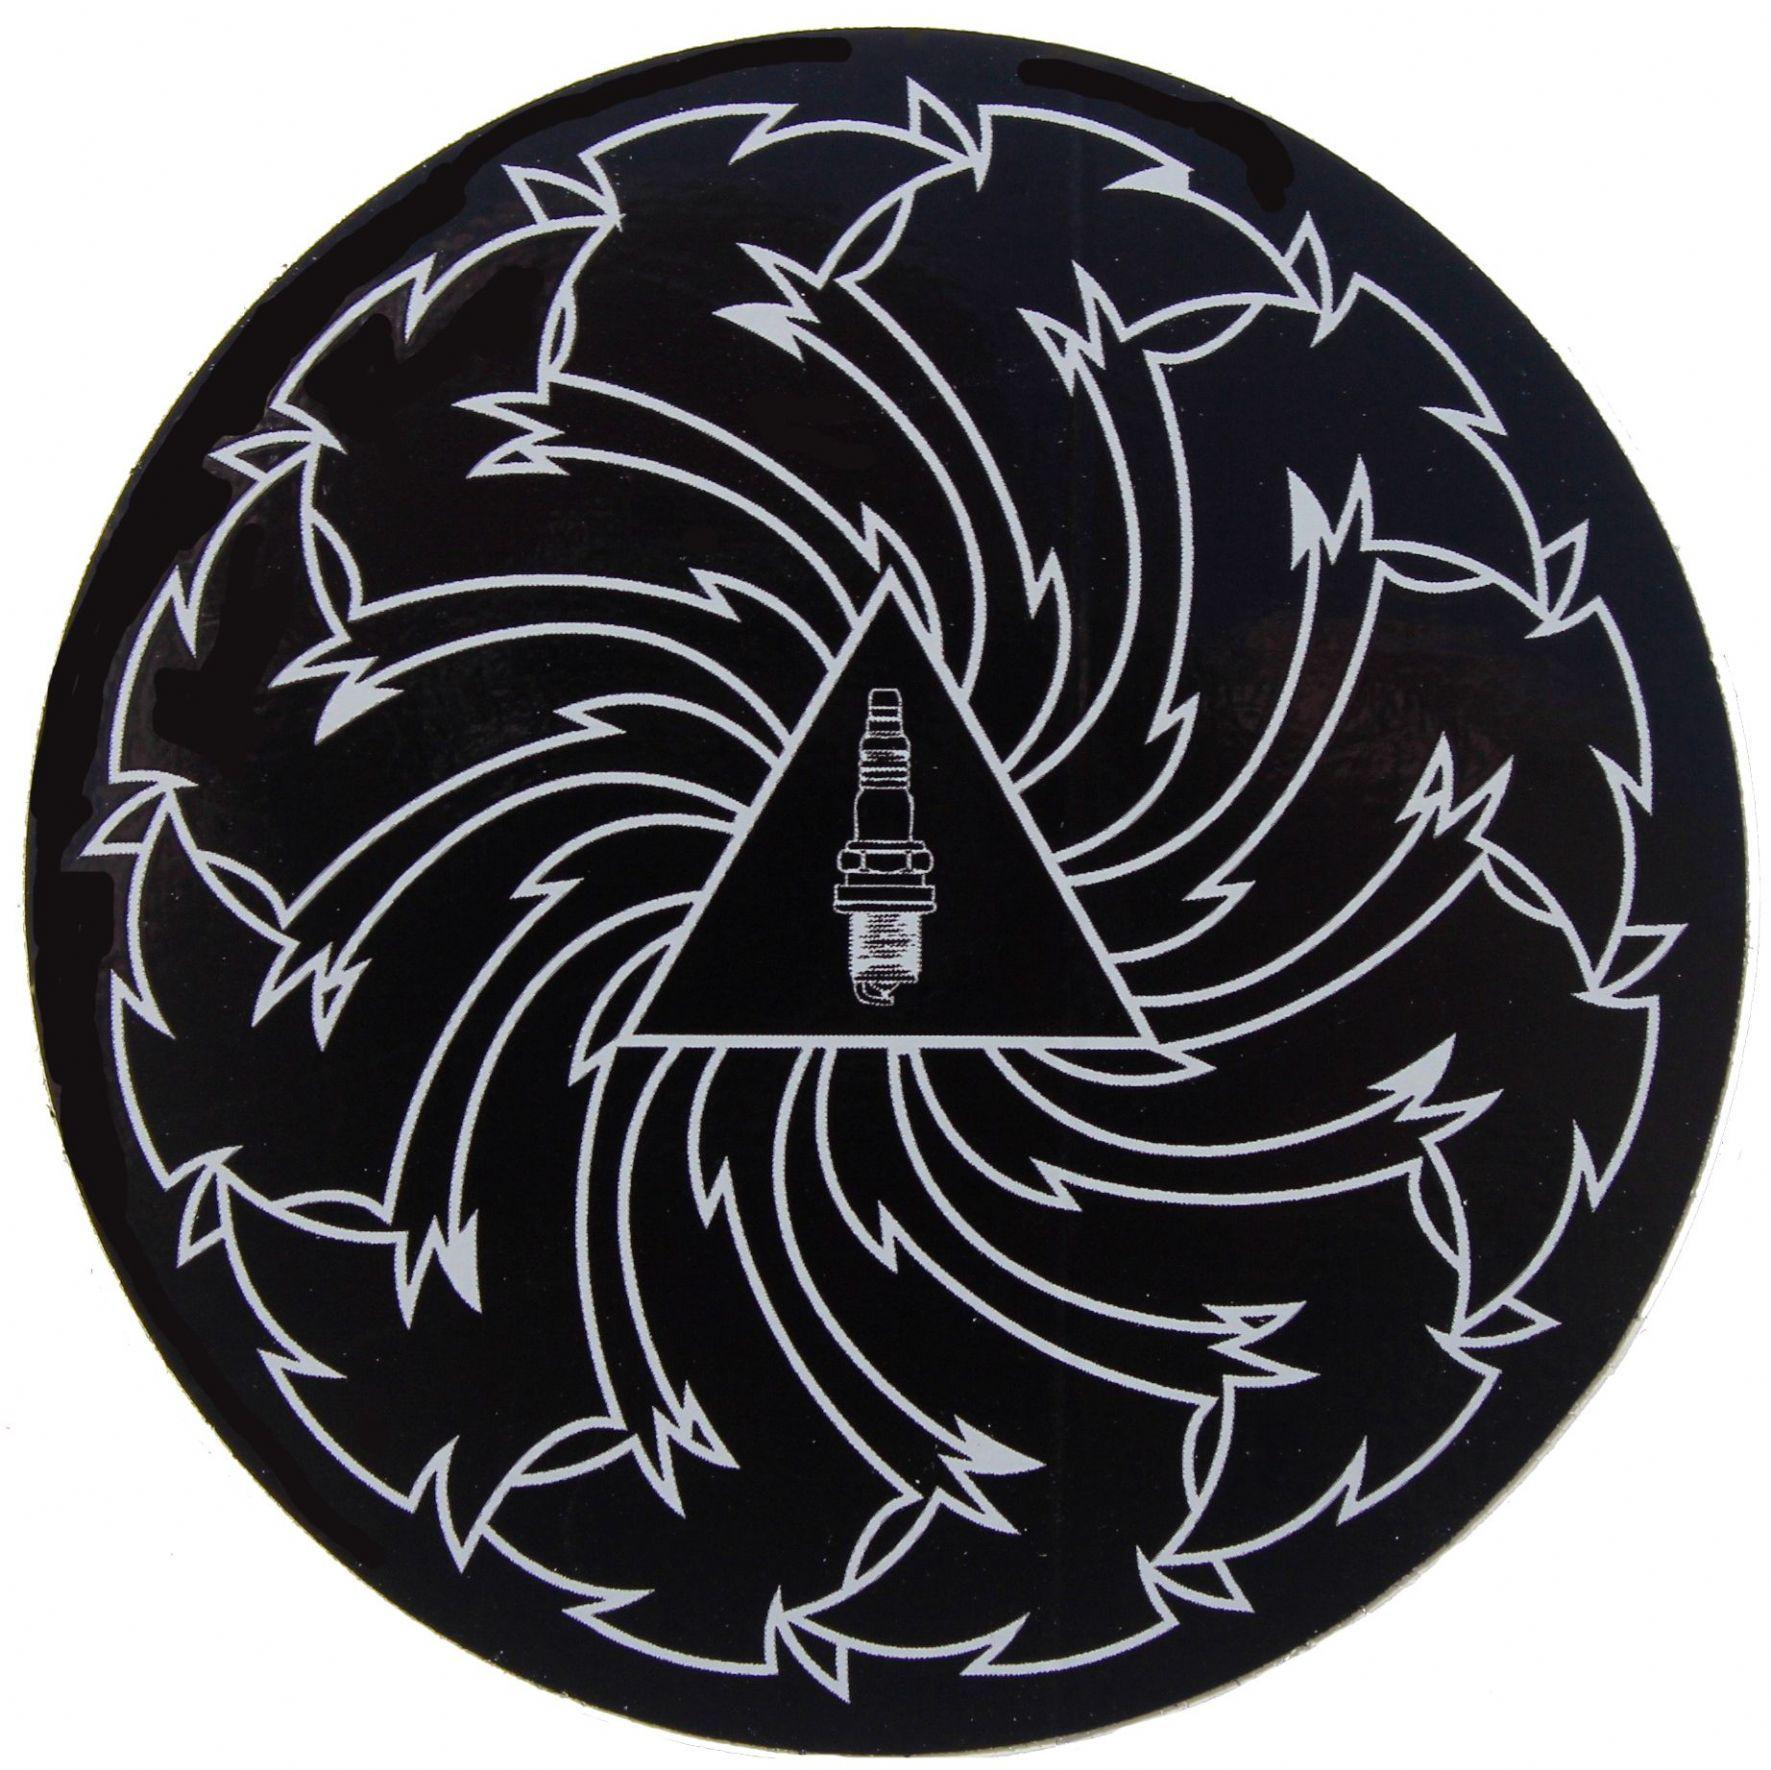 Gallery images and information soundgarden badmotorfinger tattoo - Soundgarden Logo